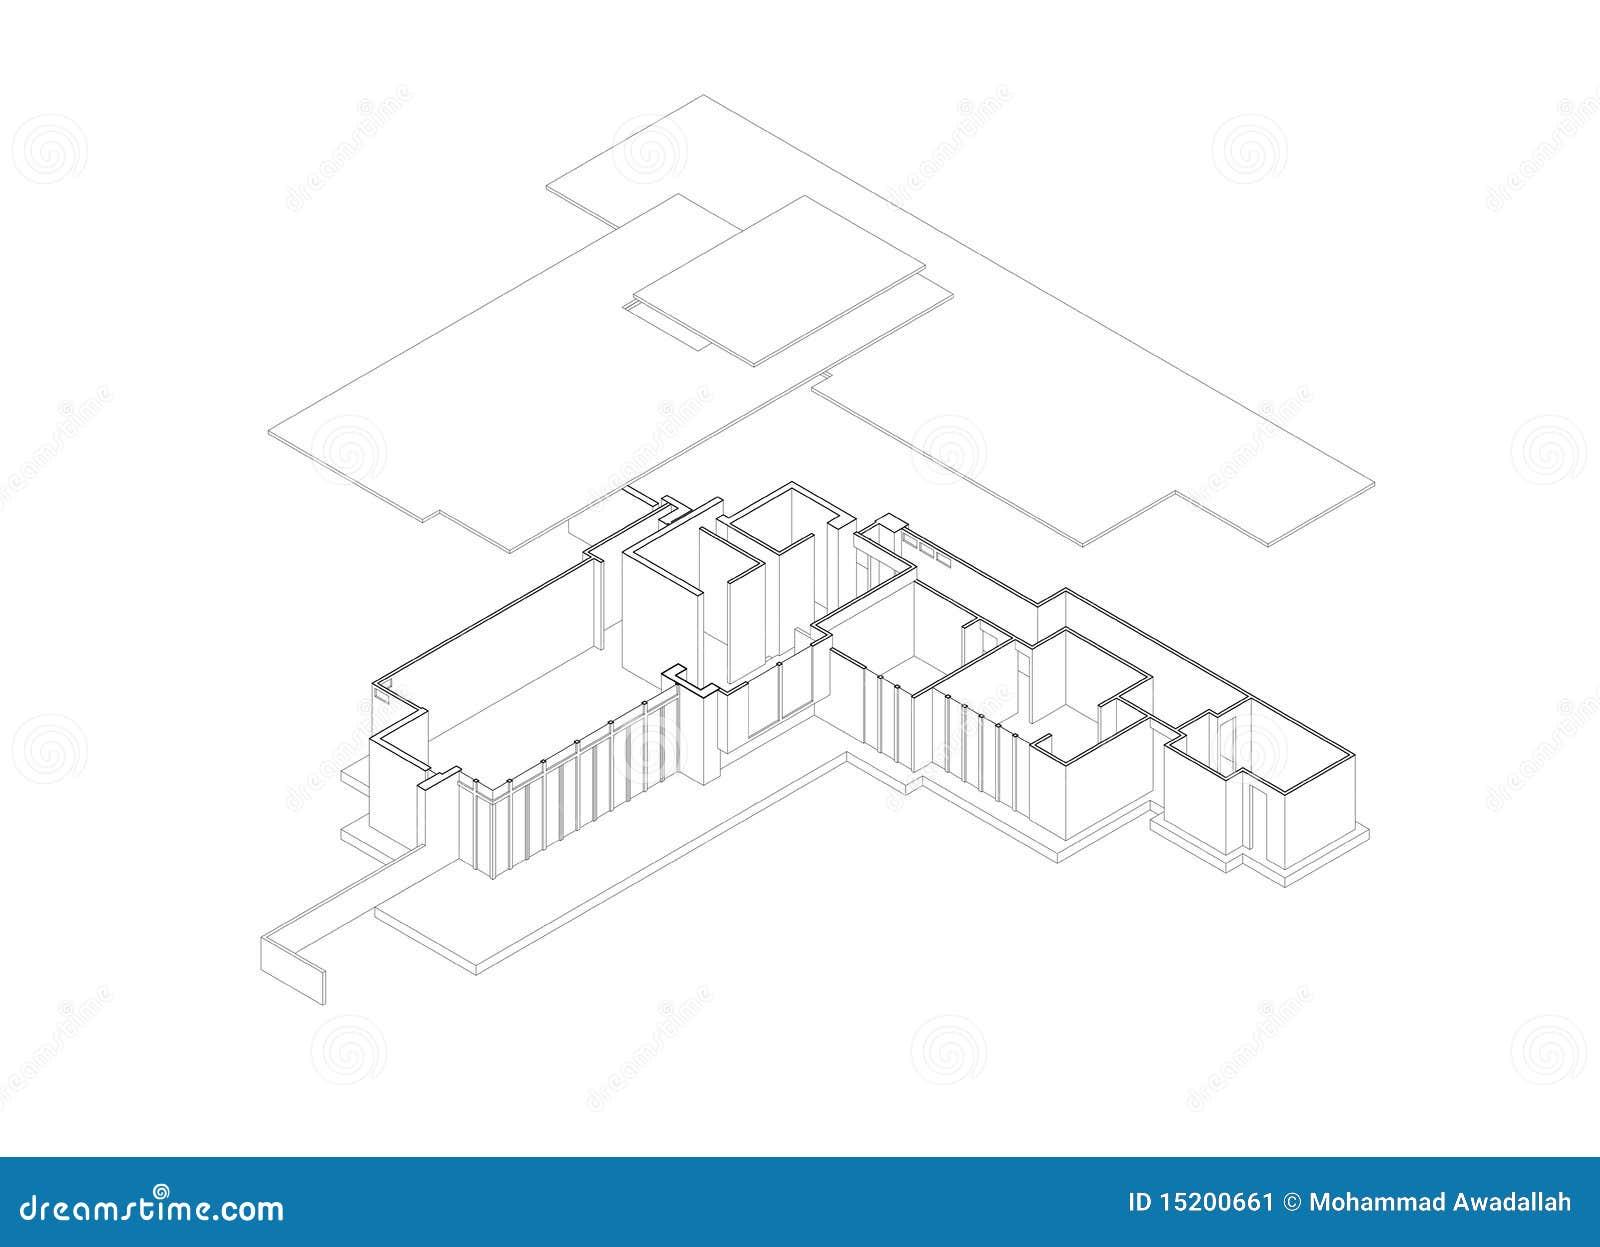 jacobs u0026 39  house exploded isometric drawing stock image